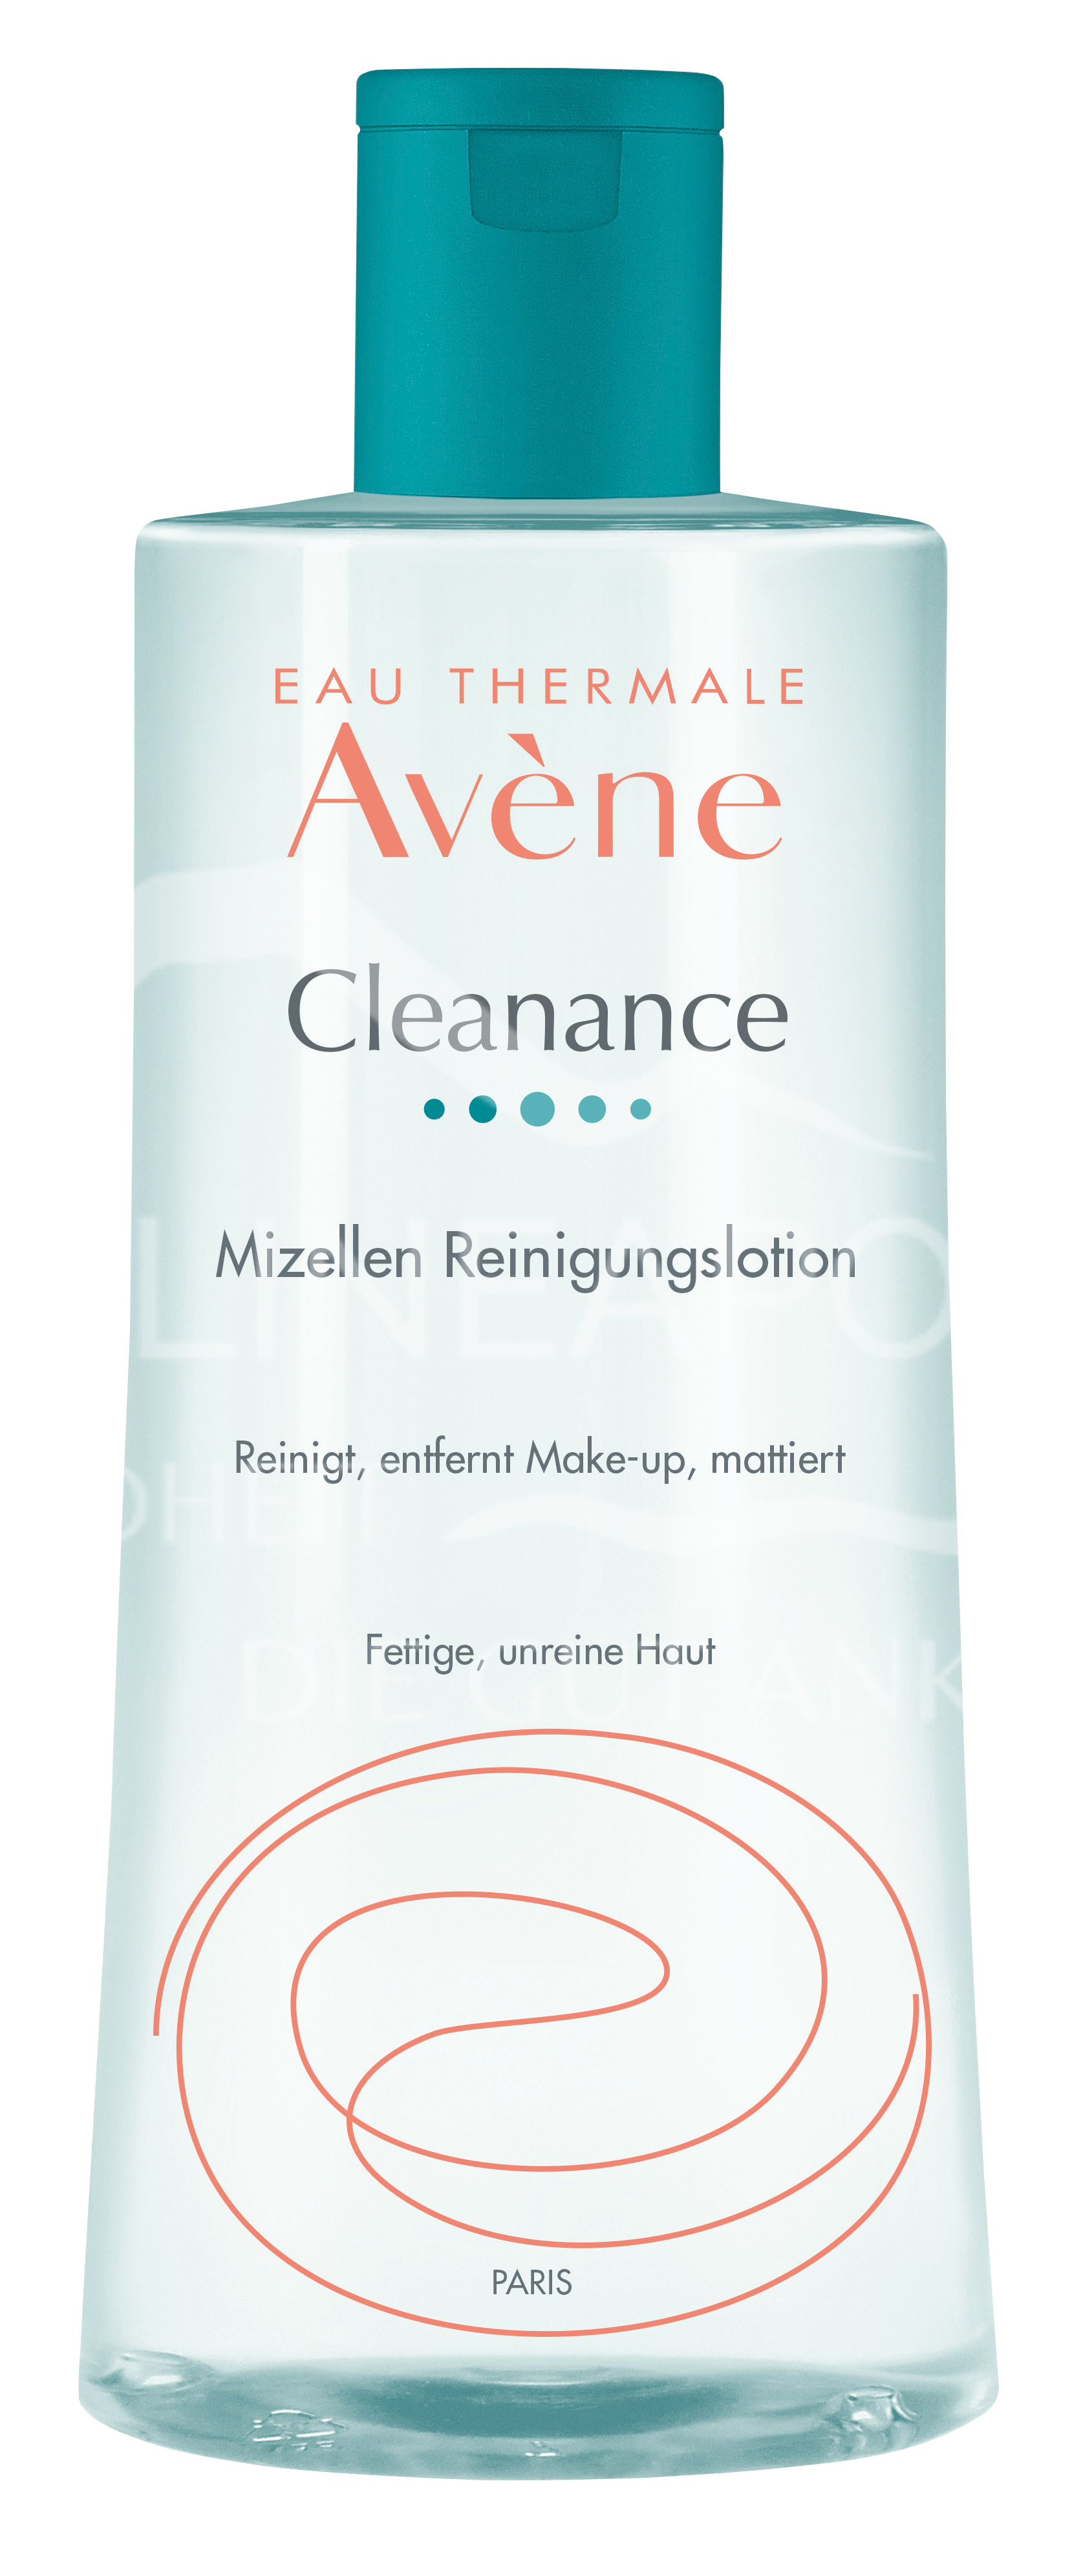 Avene Cleanance Mizellen Reinigungslotion